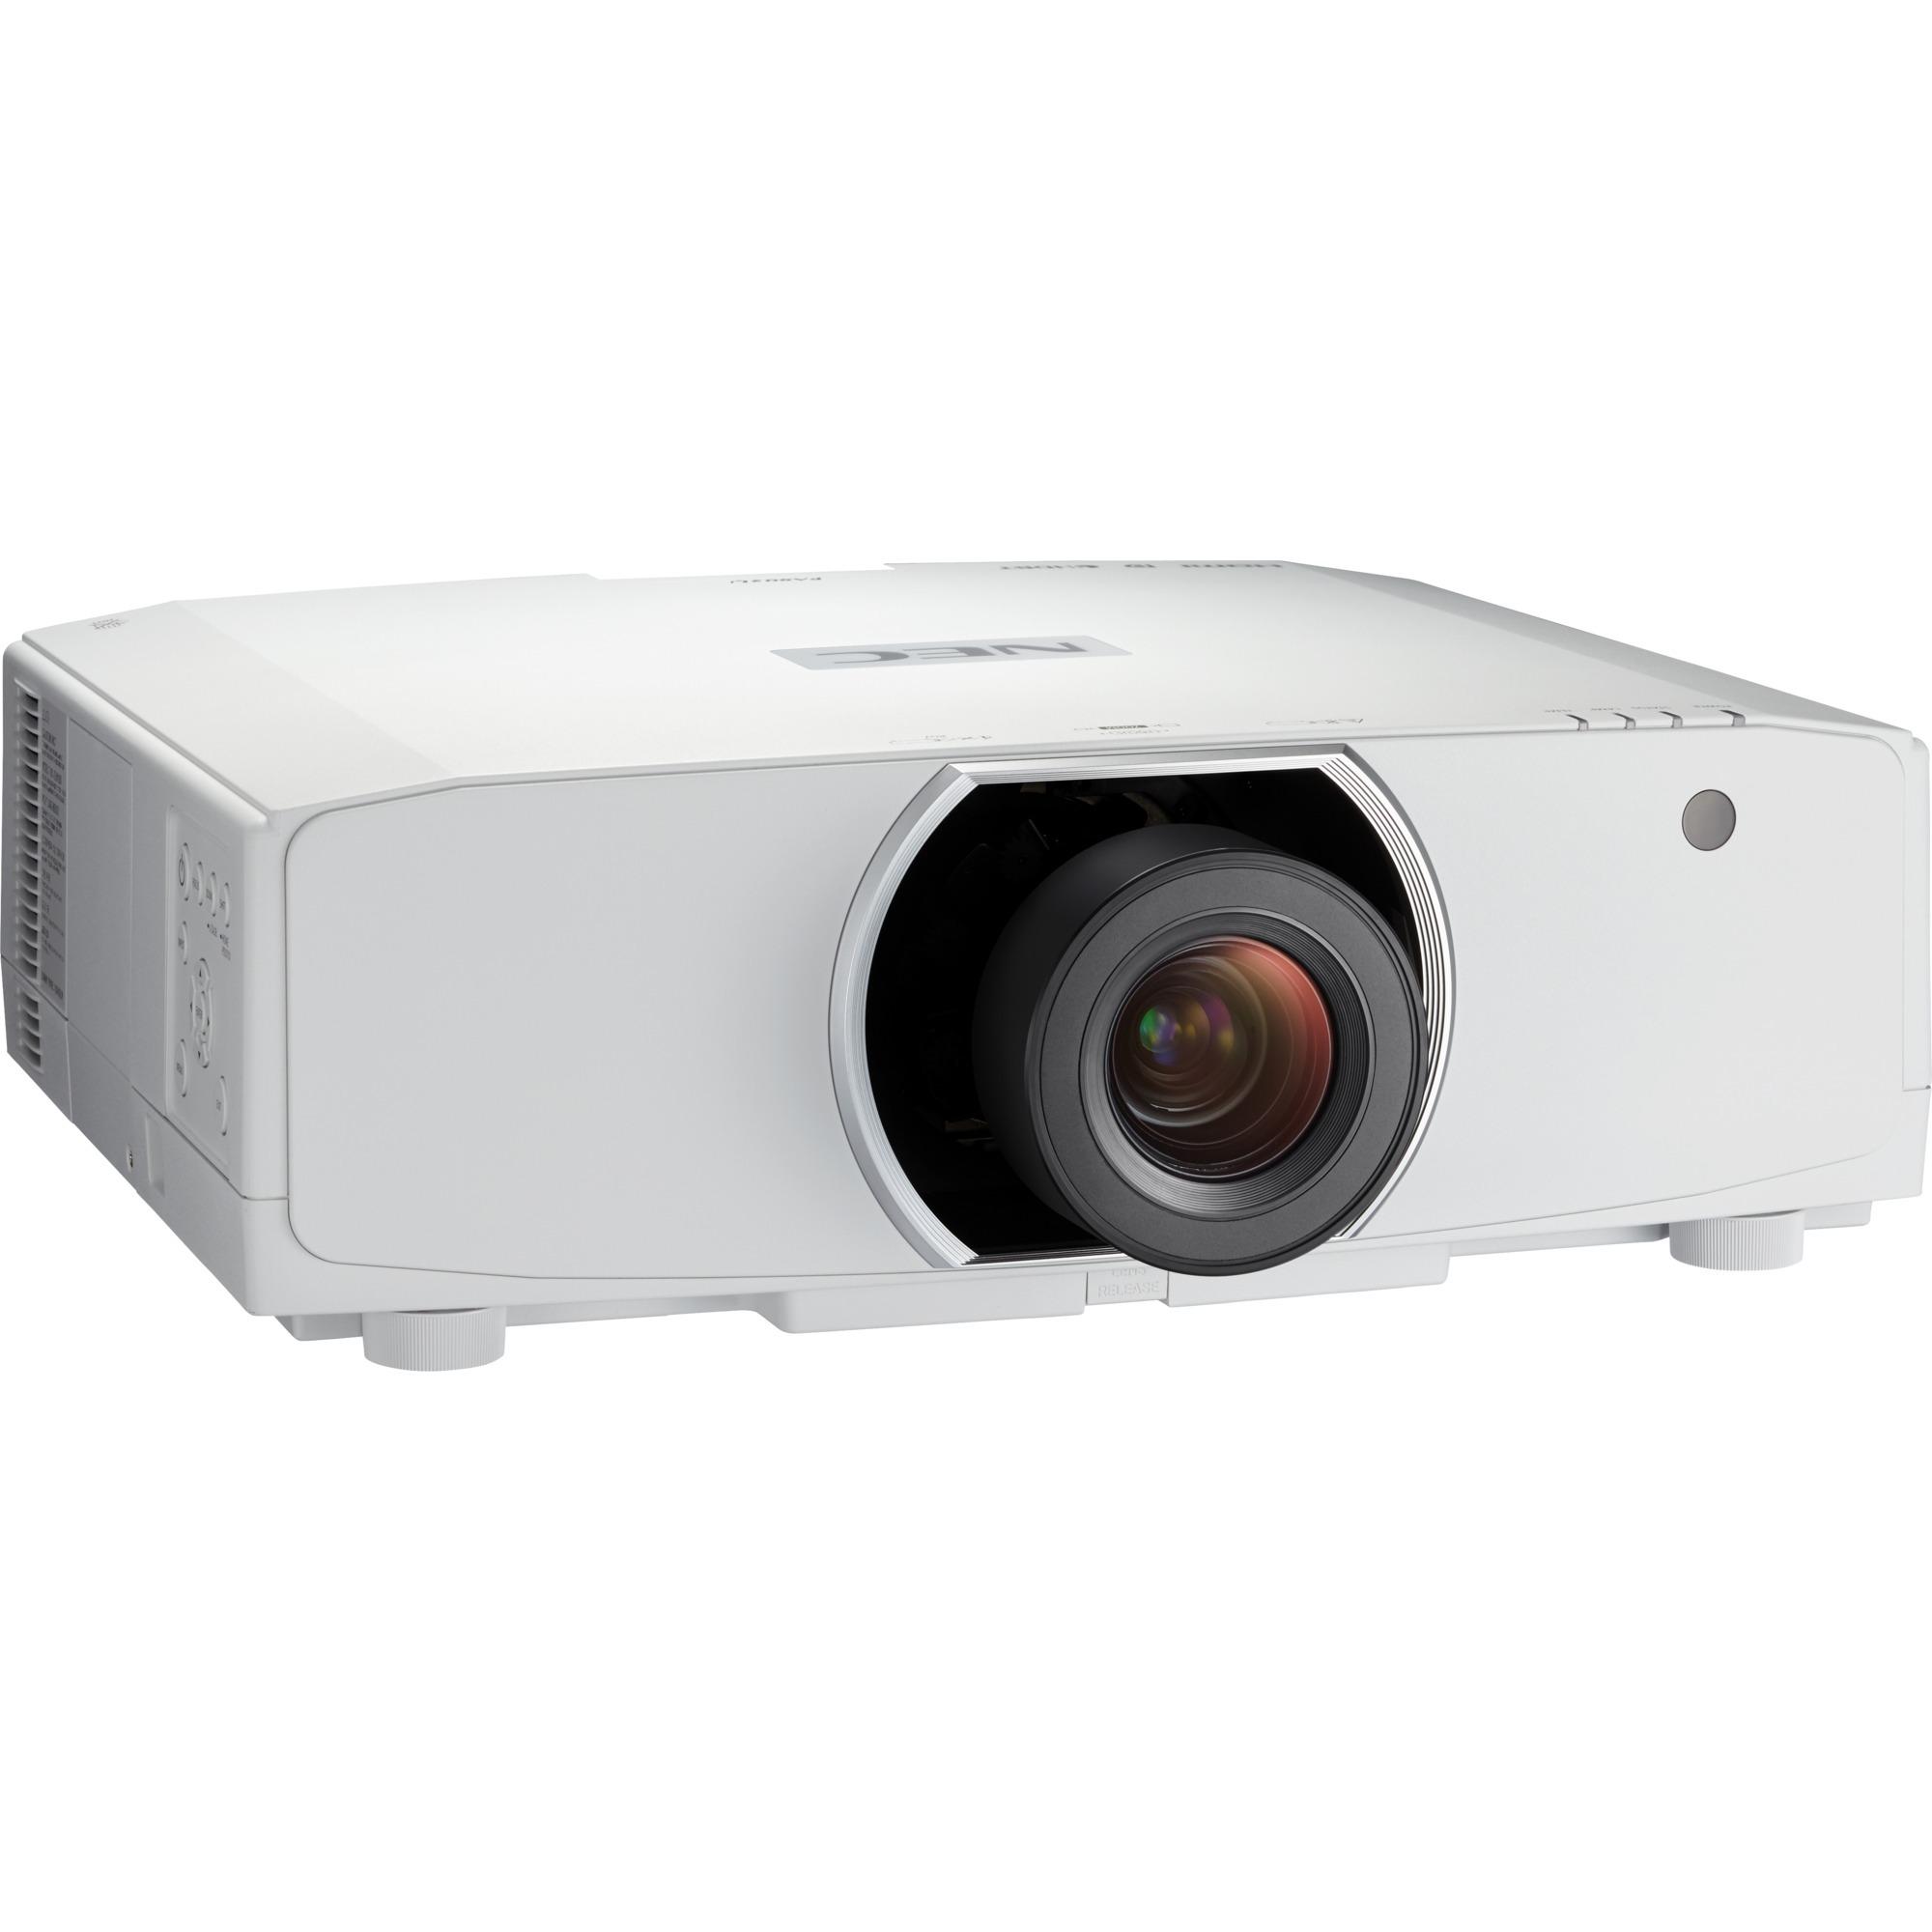 PA703W videoproyector 7000 lúmenes ANSI 3LCD WXGA (1280x800) 3D Proyector para escritorio Blanco, Proyector LCD